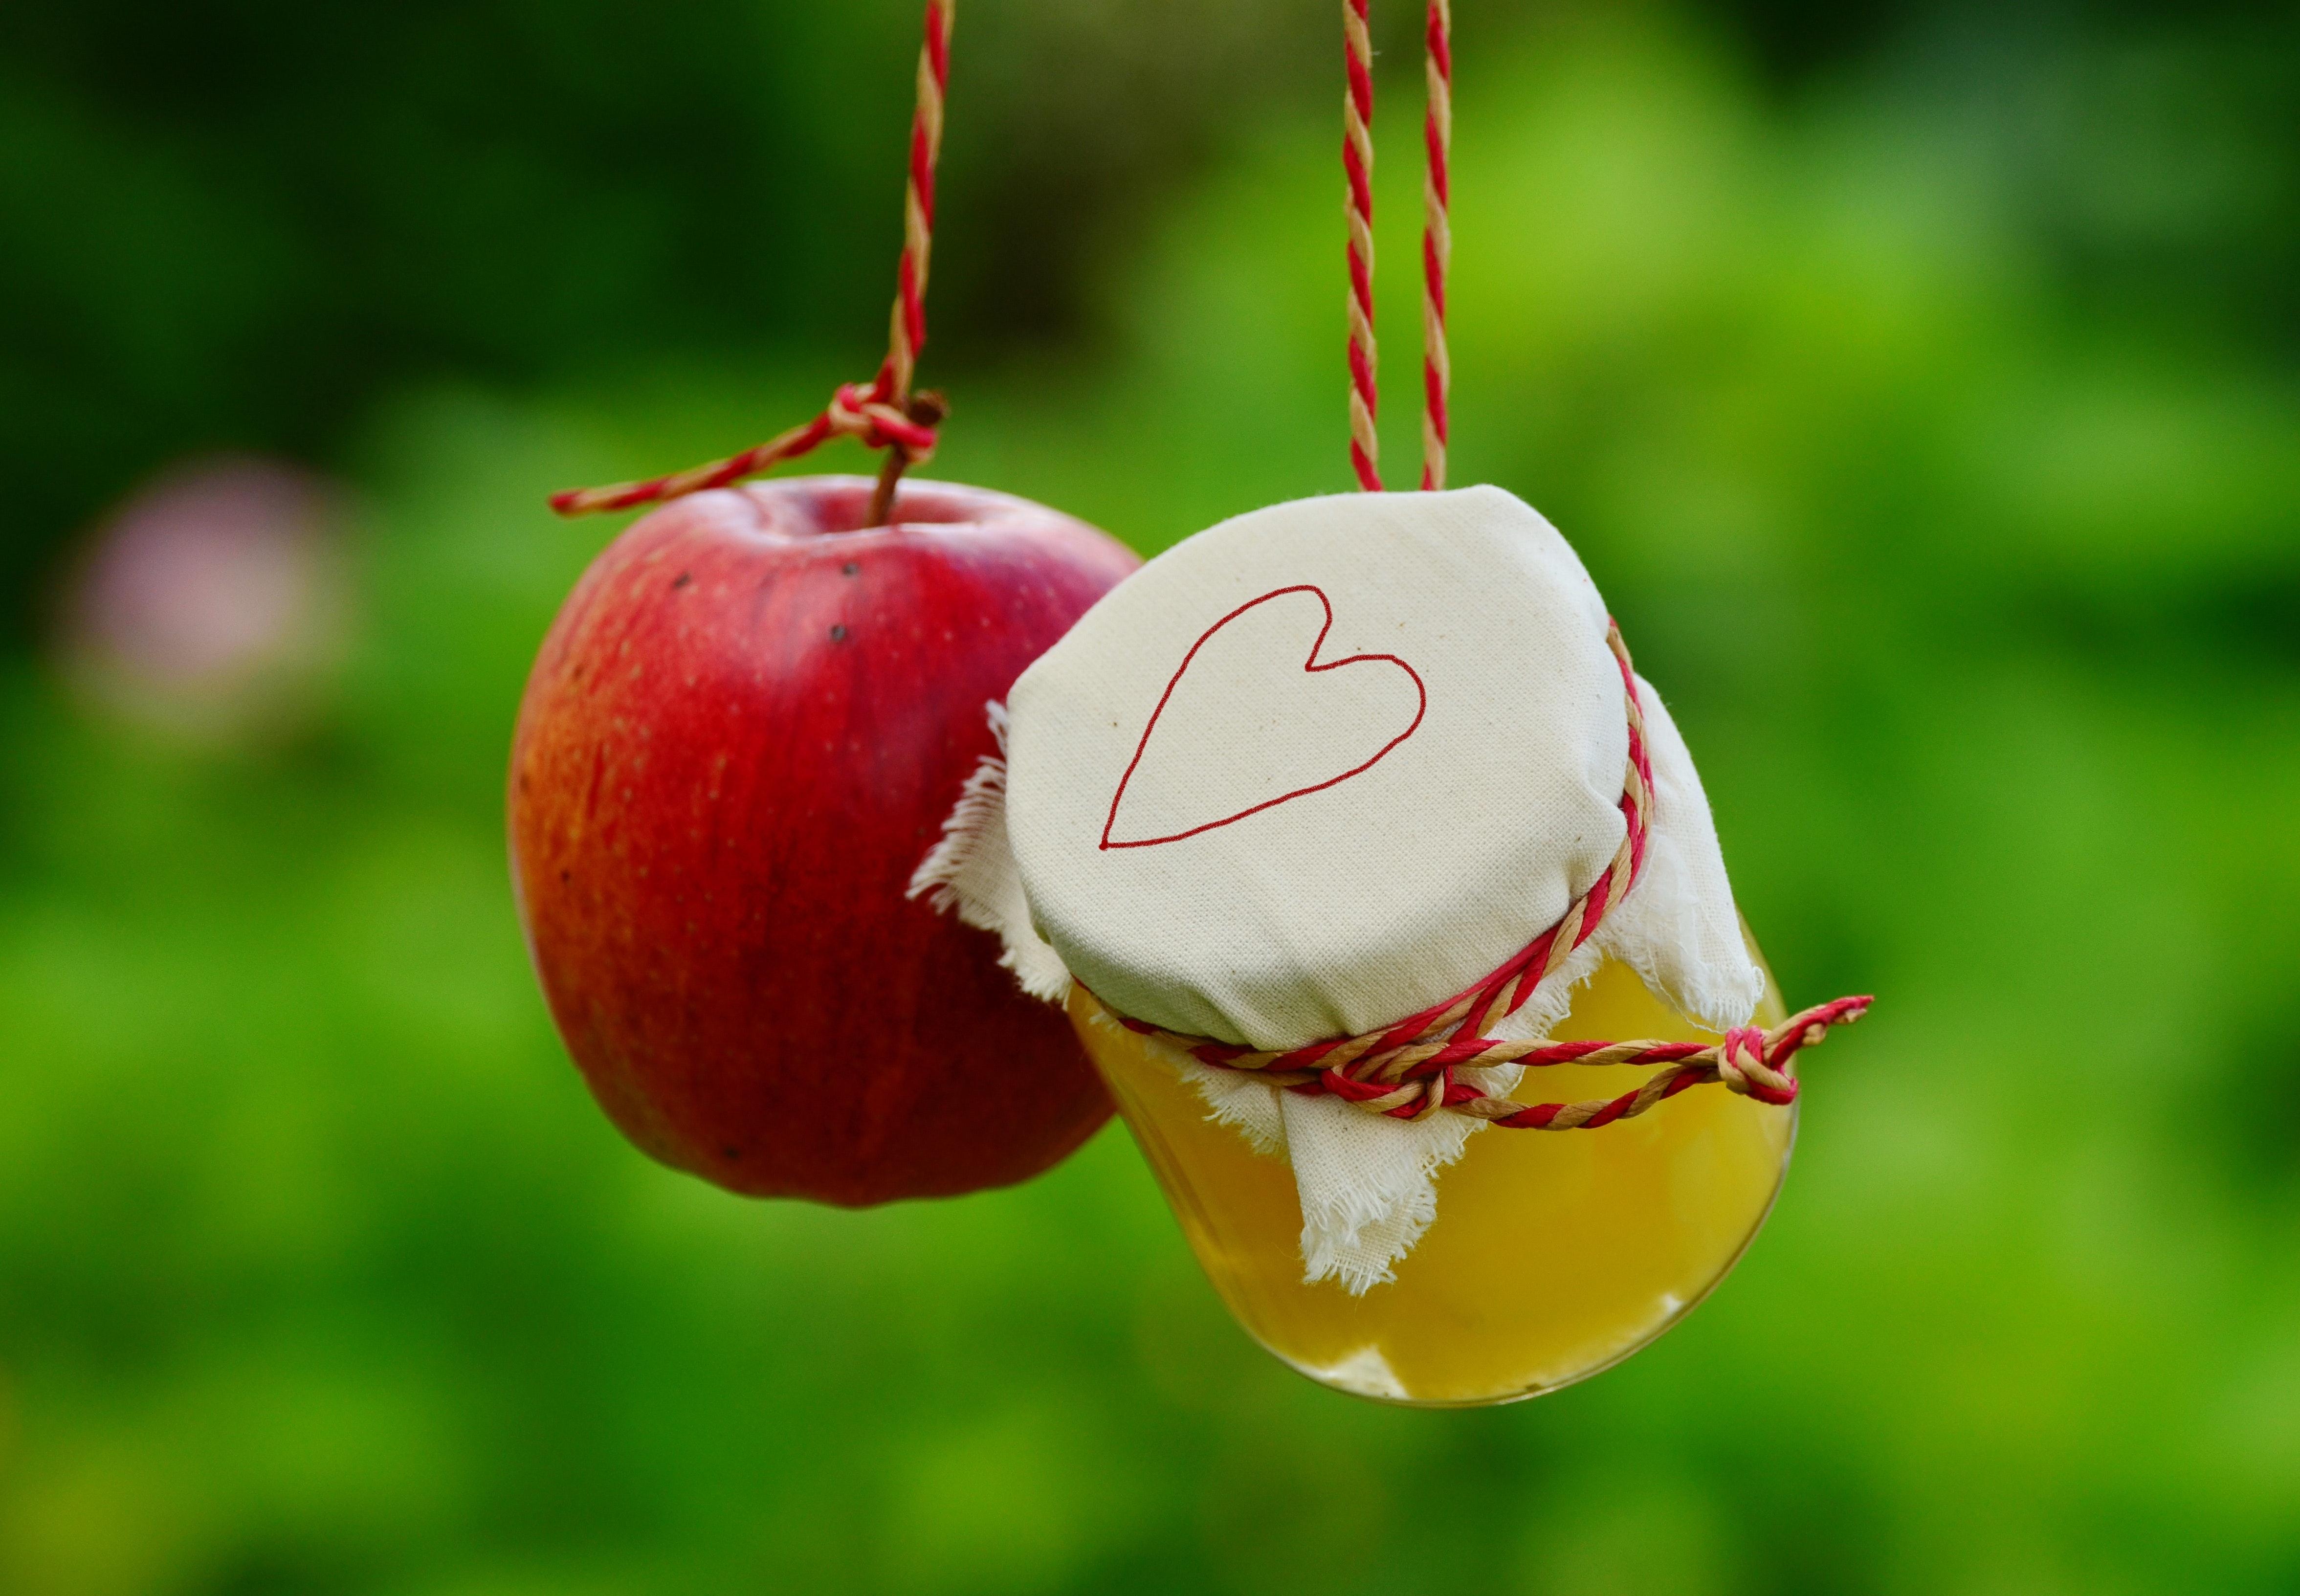 Red apple fruit beside clear glass jar photo